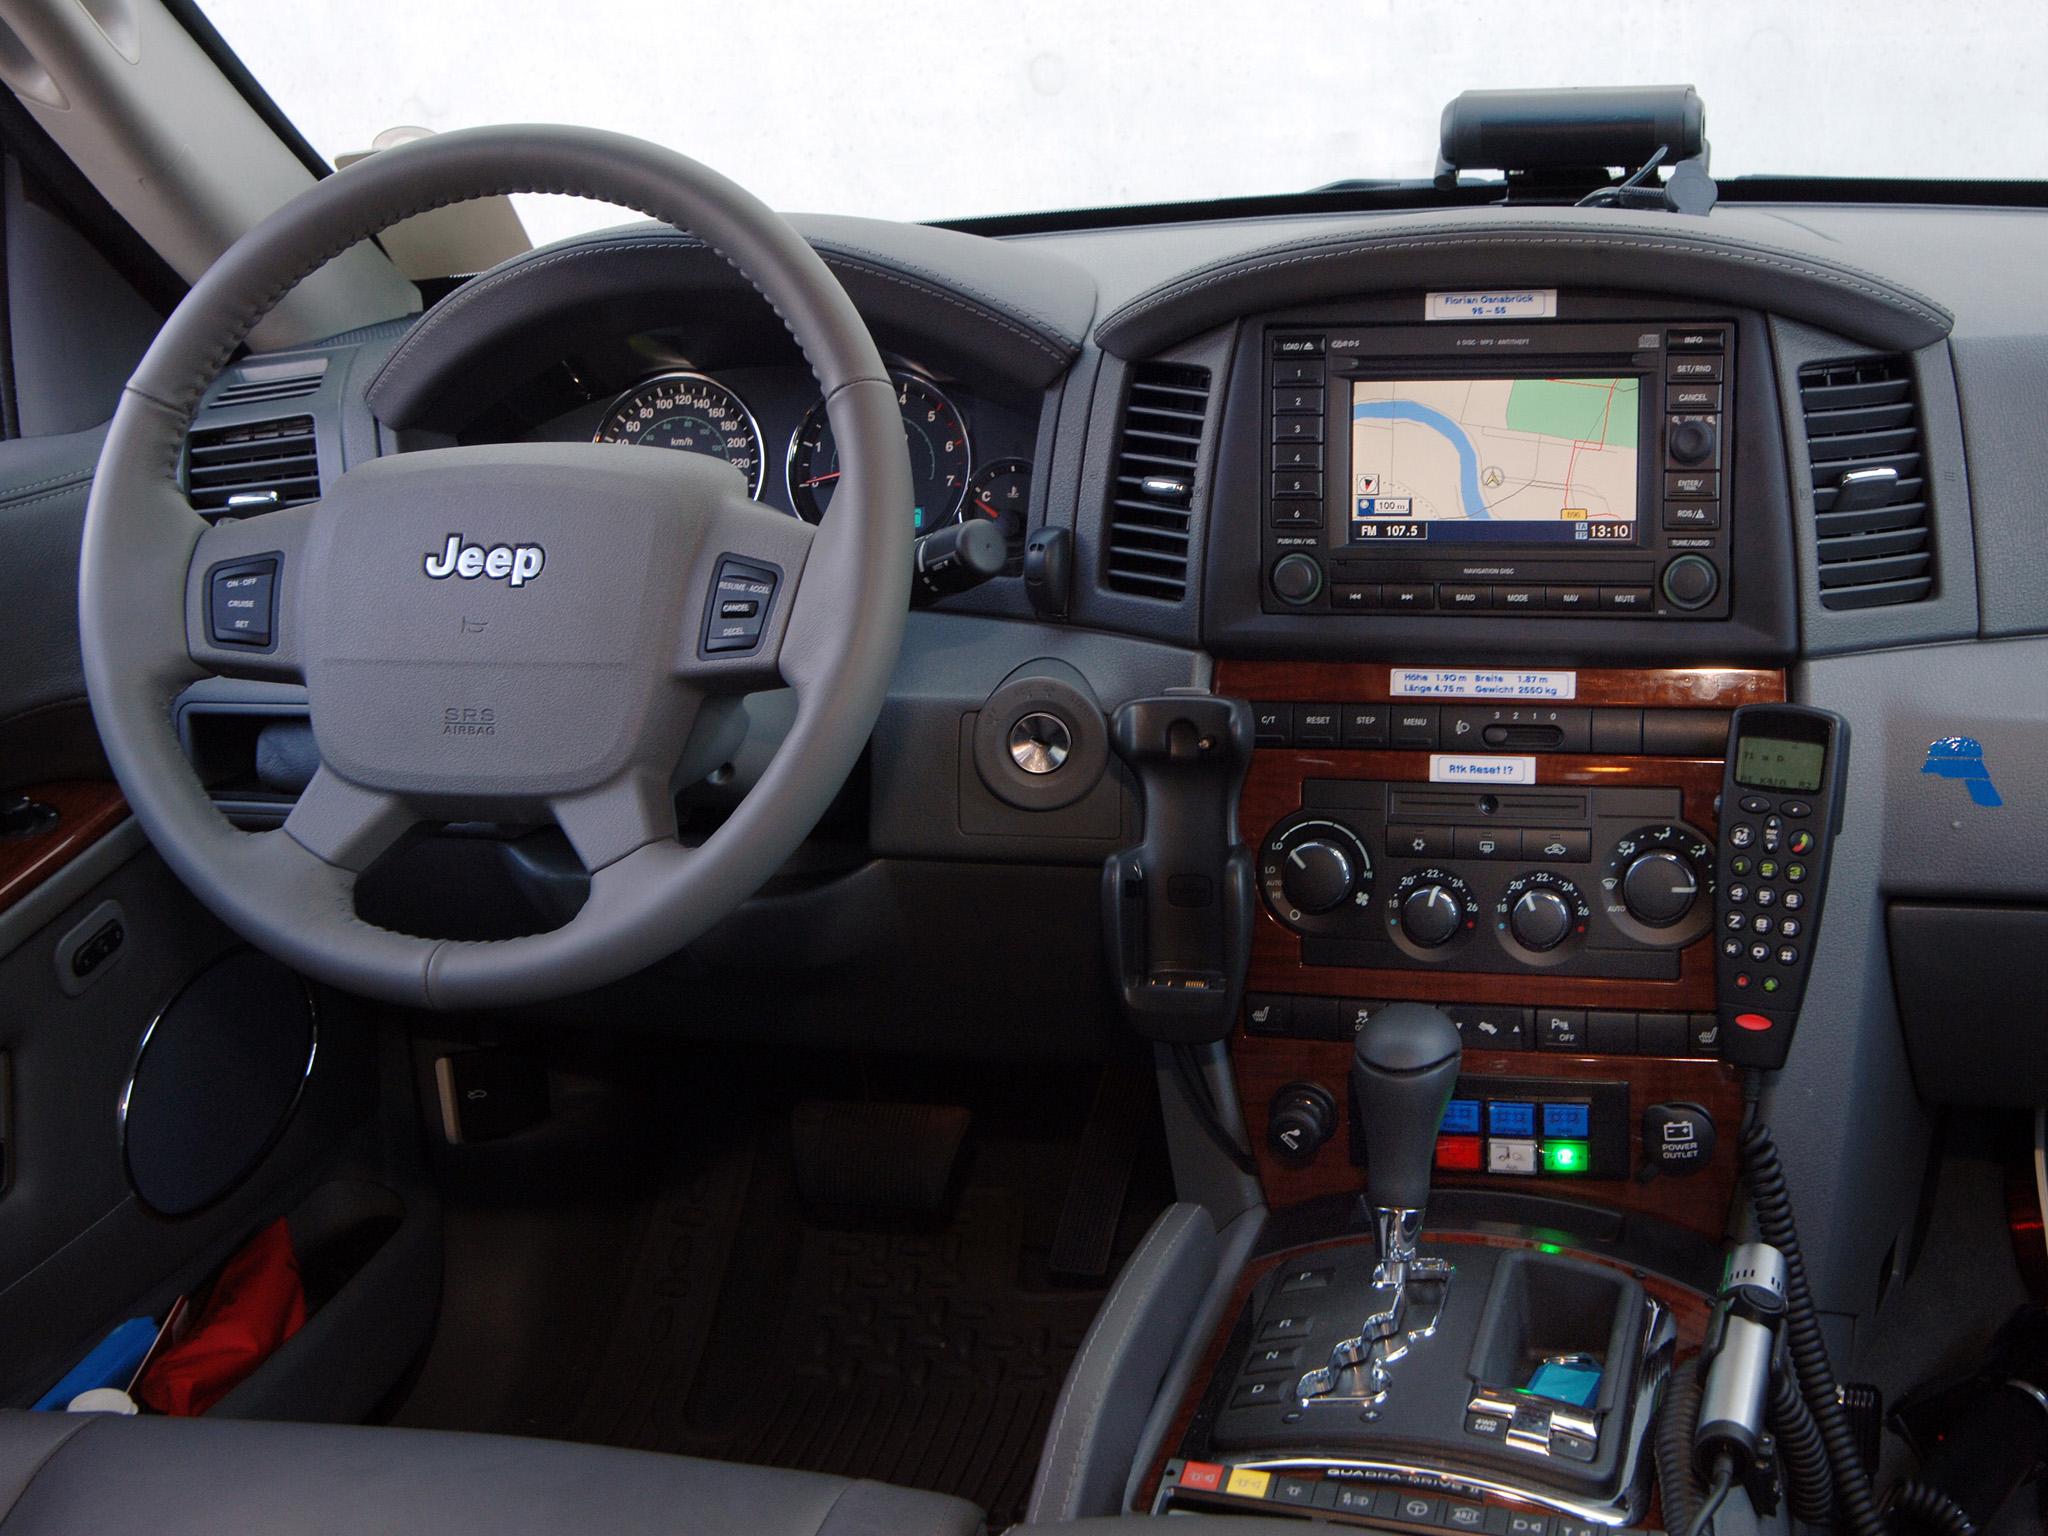 2005 Jeep Grand Cherokee Notarzt Wk Emergency Ambulance Firetruck Interior G Wallpaper